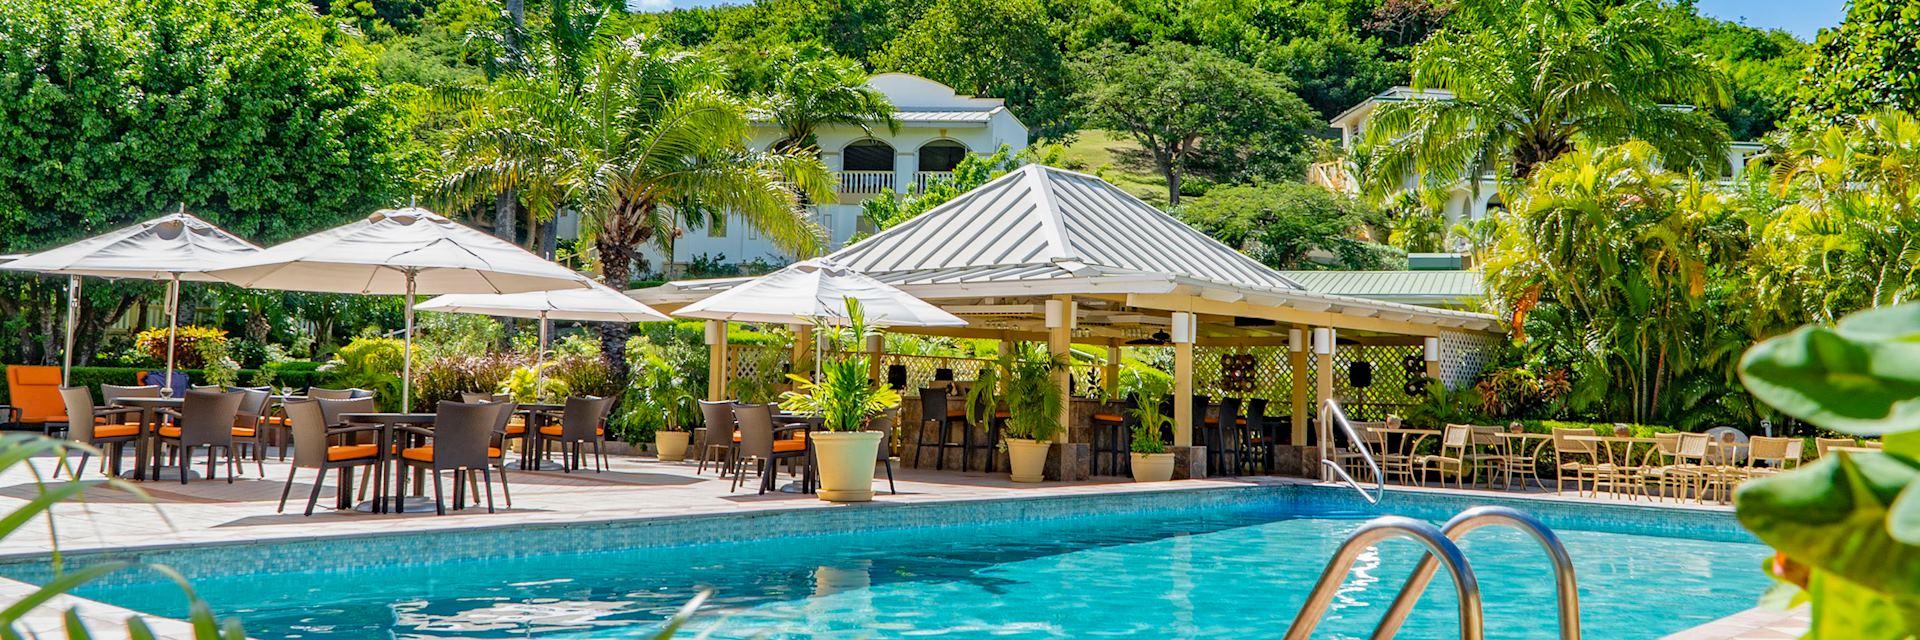 Blue Horizons Garden Resort pool, Grenada